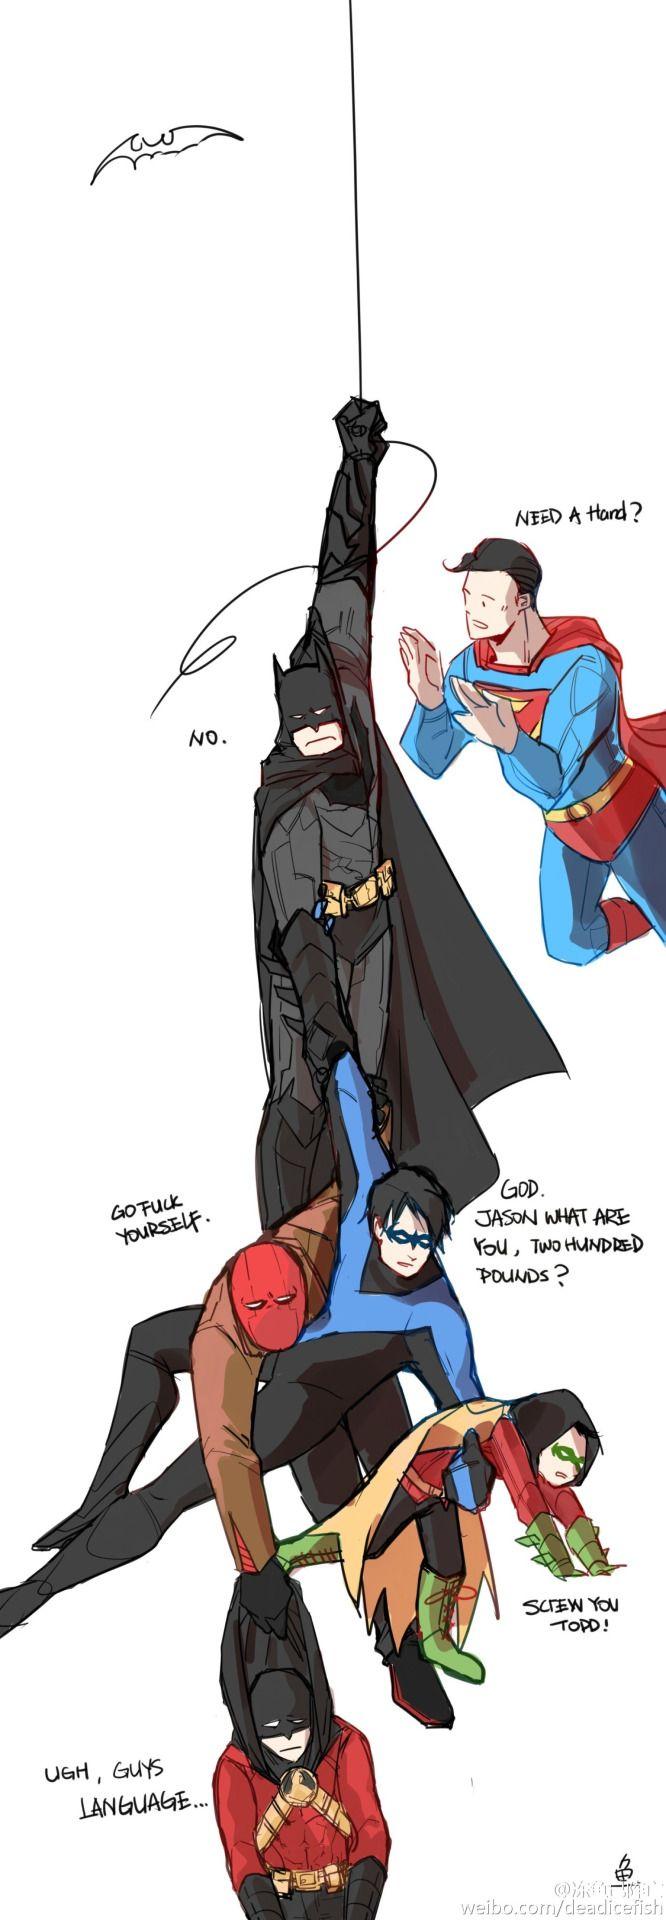 Batfamily. Batman. Nightwing. Red Hood. Red Robin. Robin. Ahahaha. These idiots.